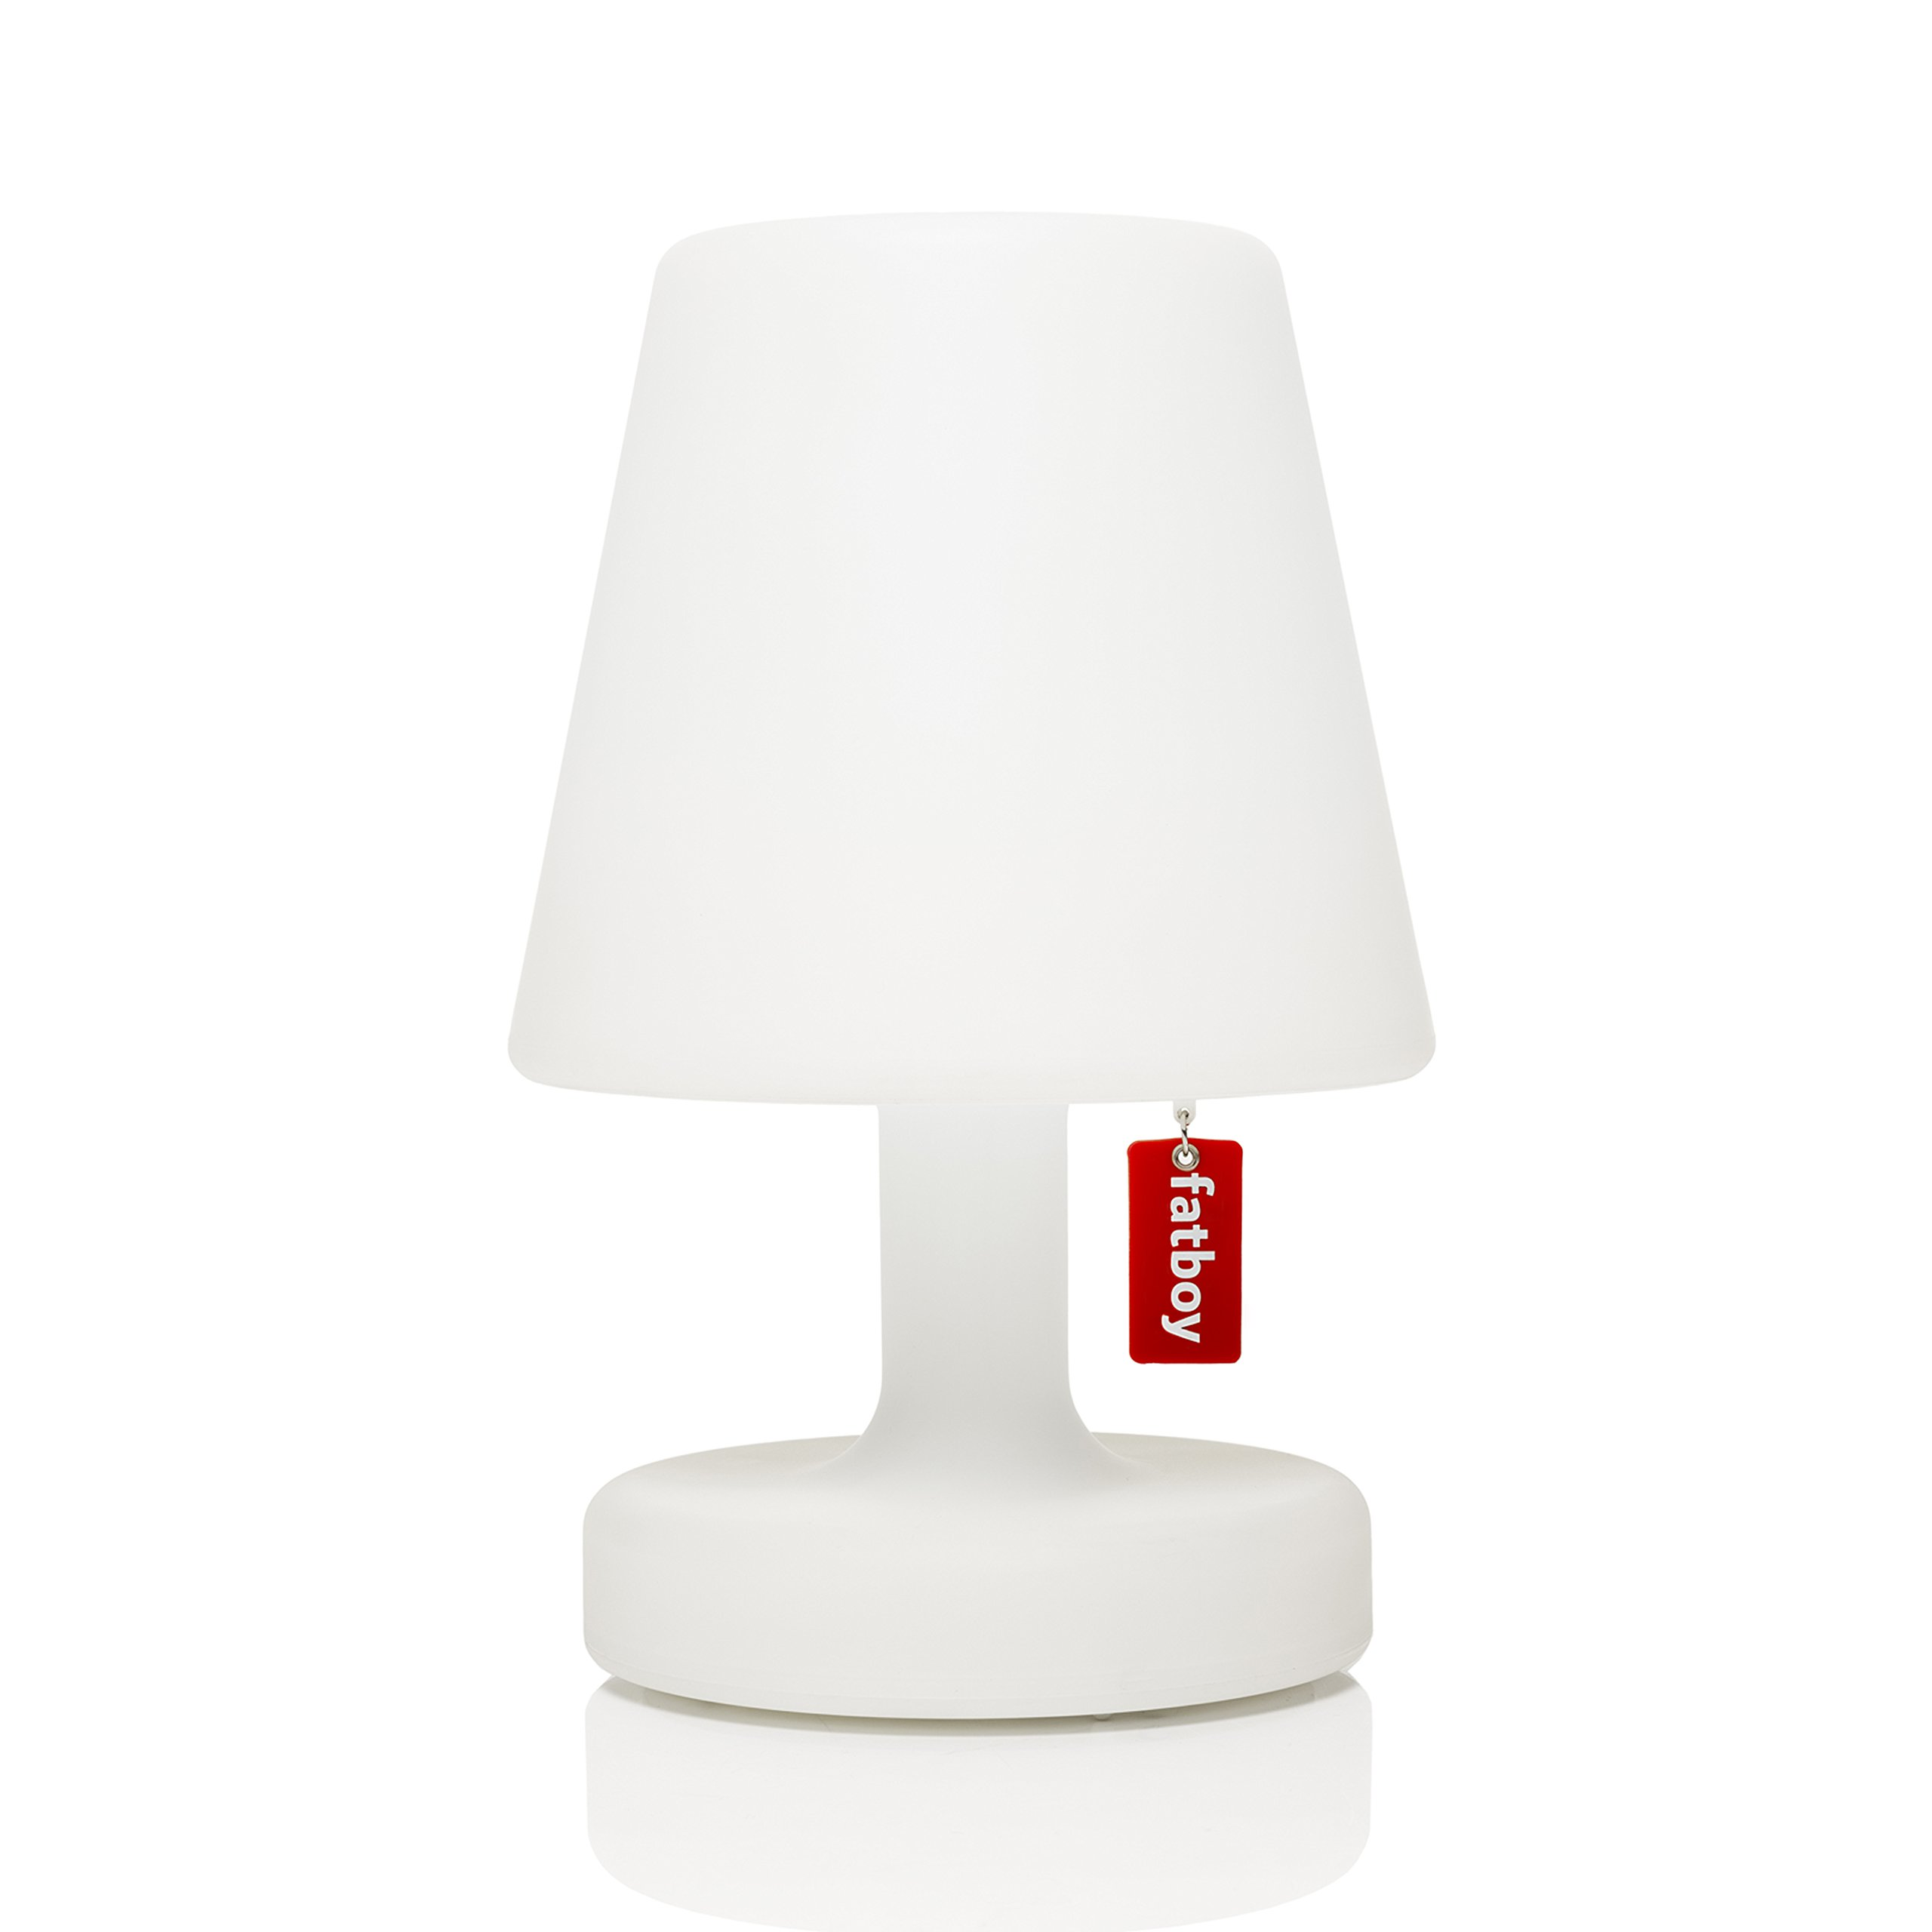 Fatboy Edison The Petit Tischlampe Outdoor Lampe Nachttischlampe